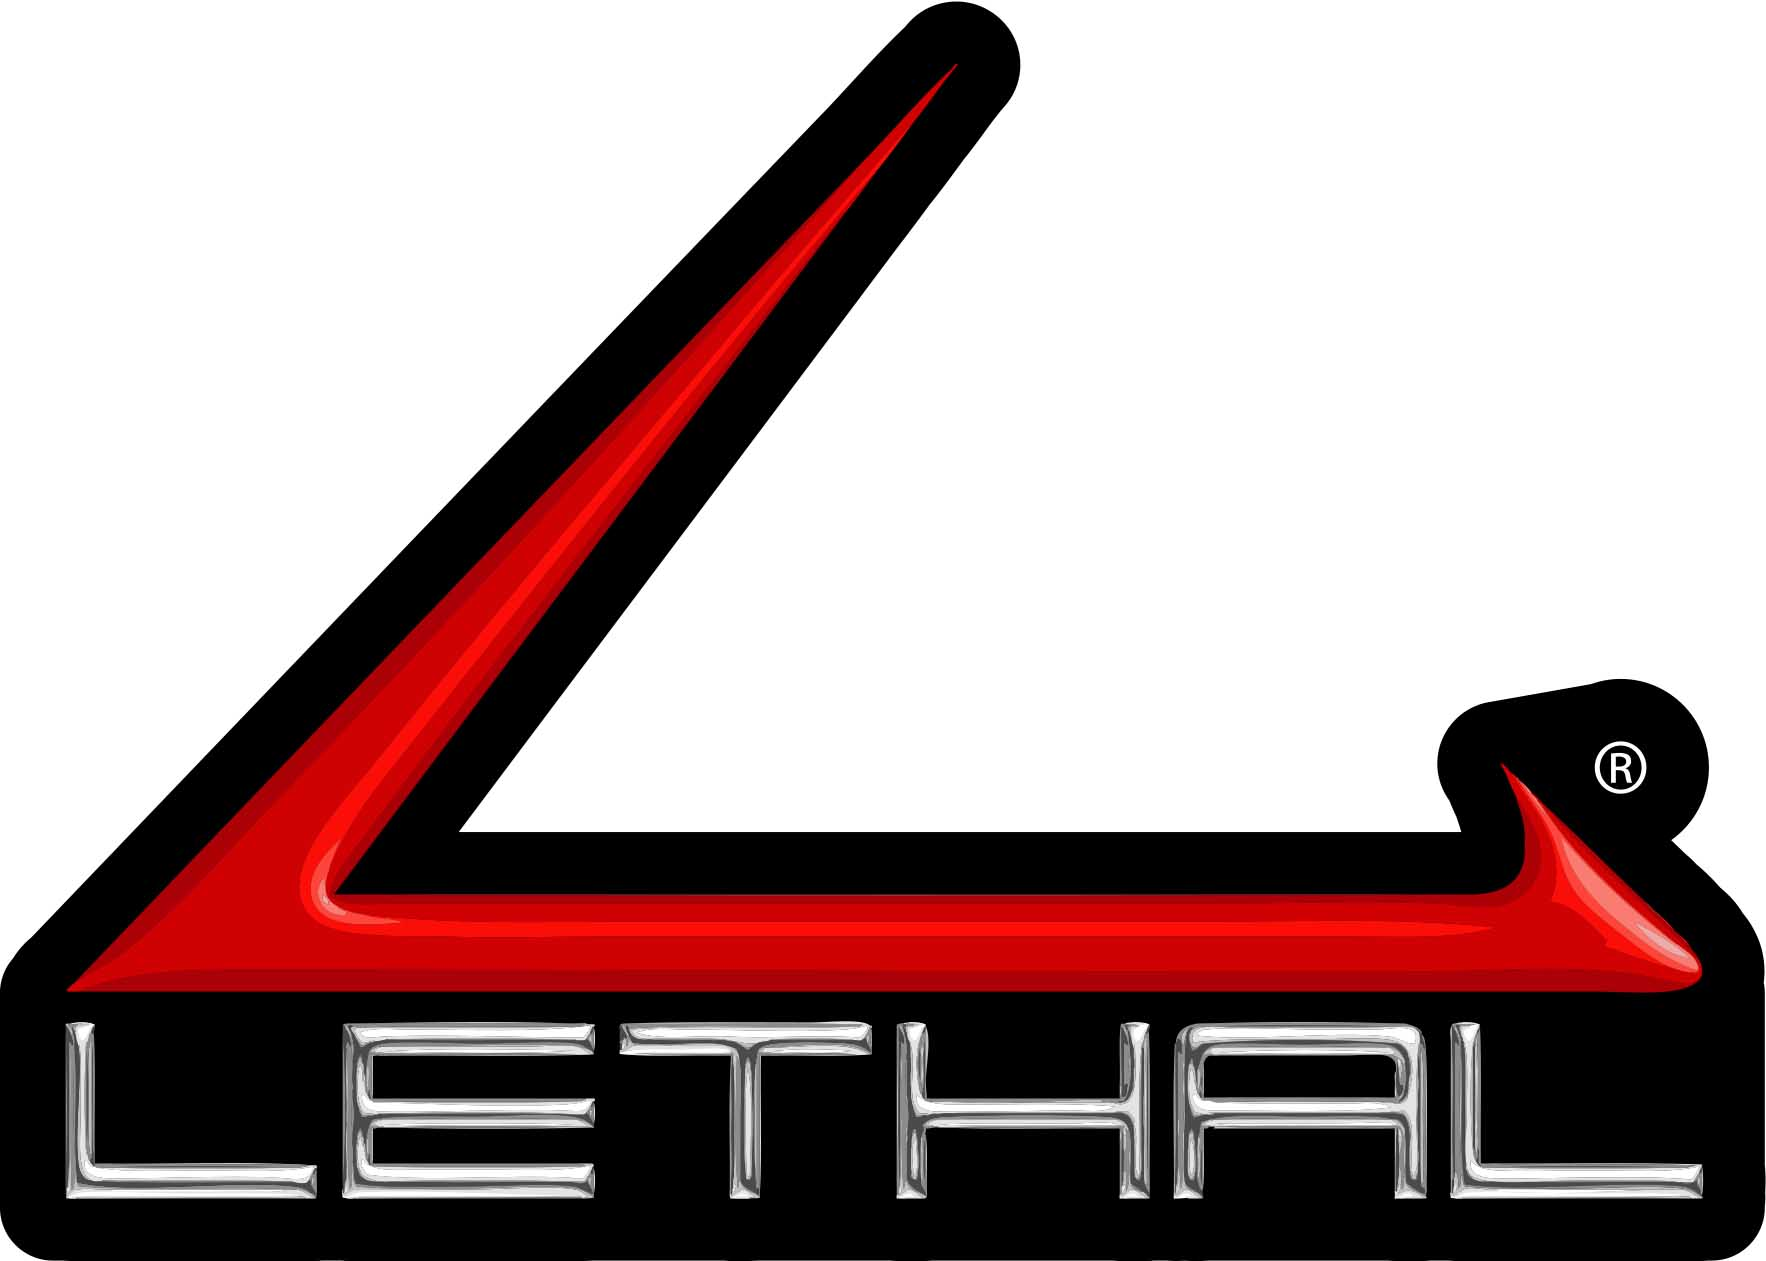 LethalLogo_3DVectorDesign_Decal_v2